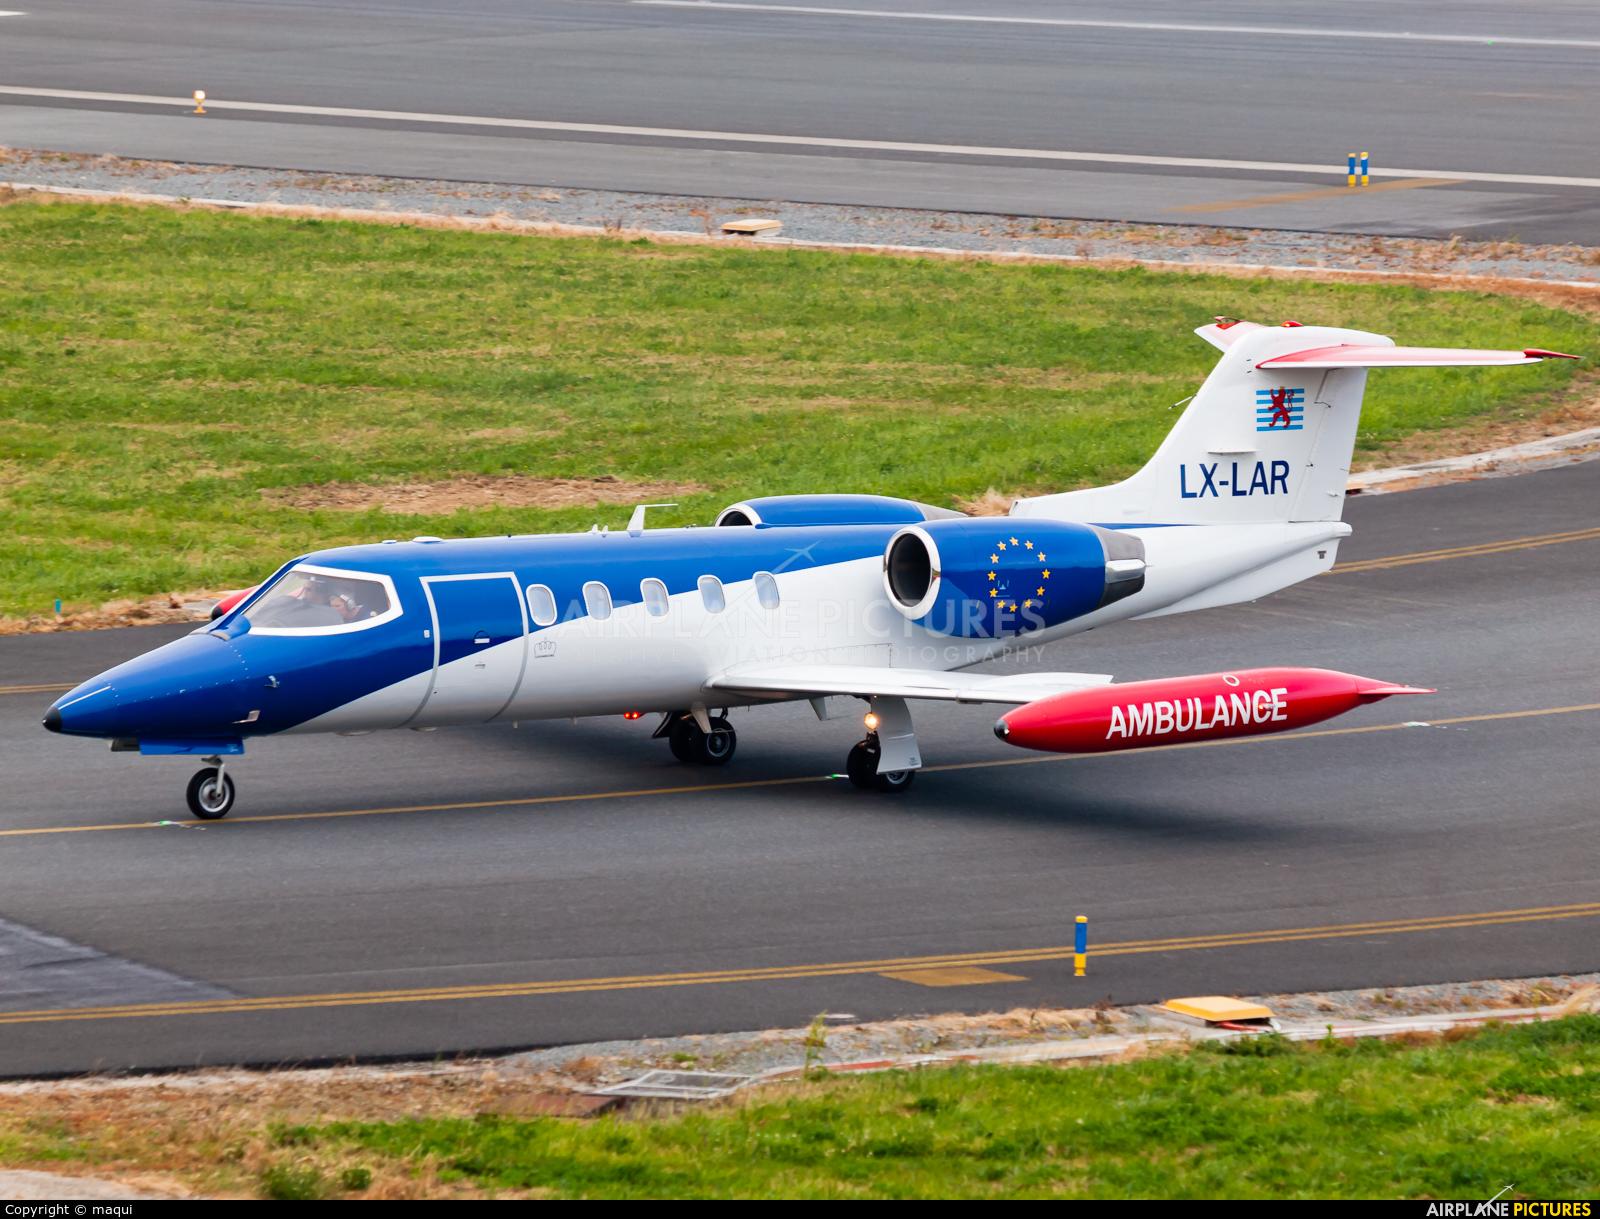 Luxembourg Air Rescue LX-LAR aircraft at La Coruña